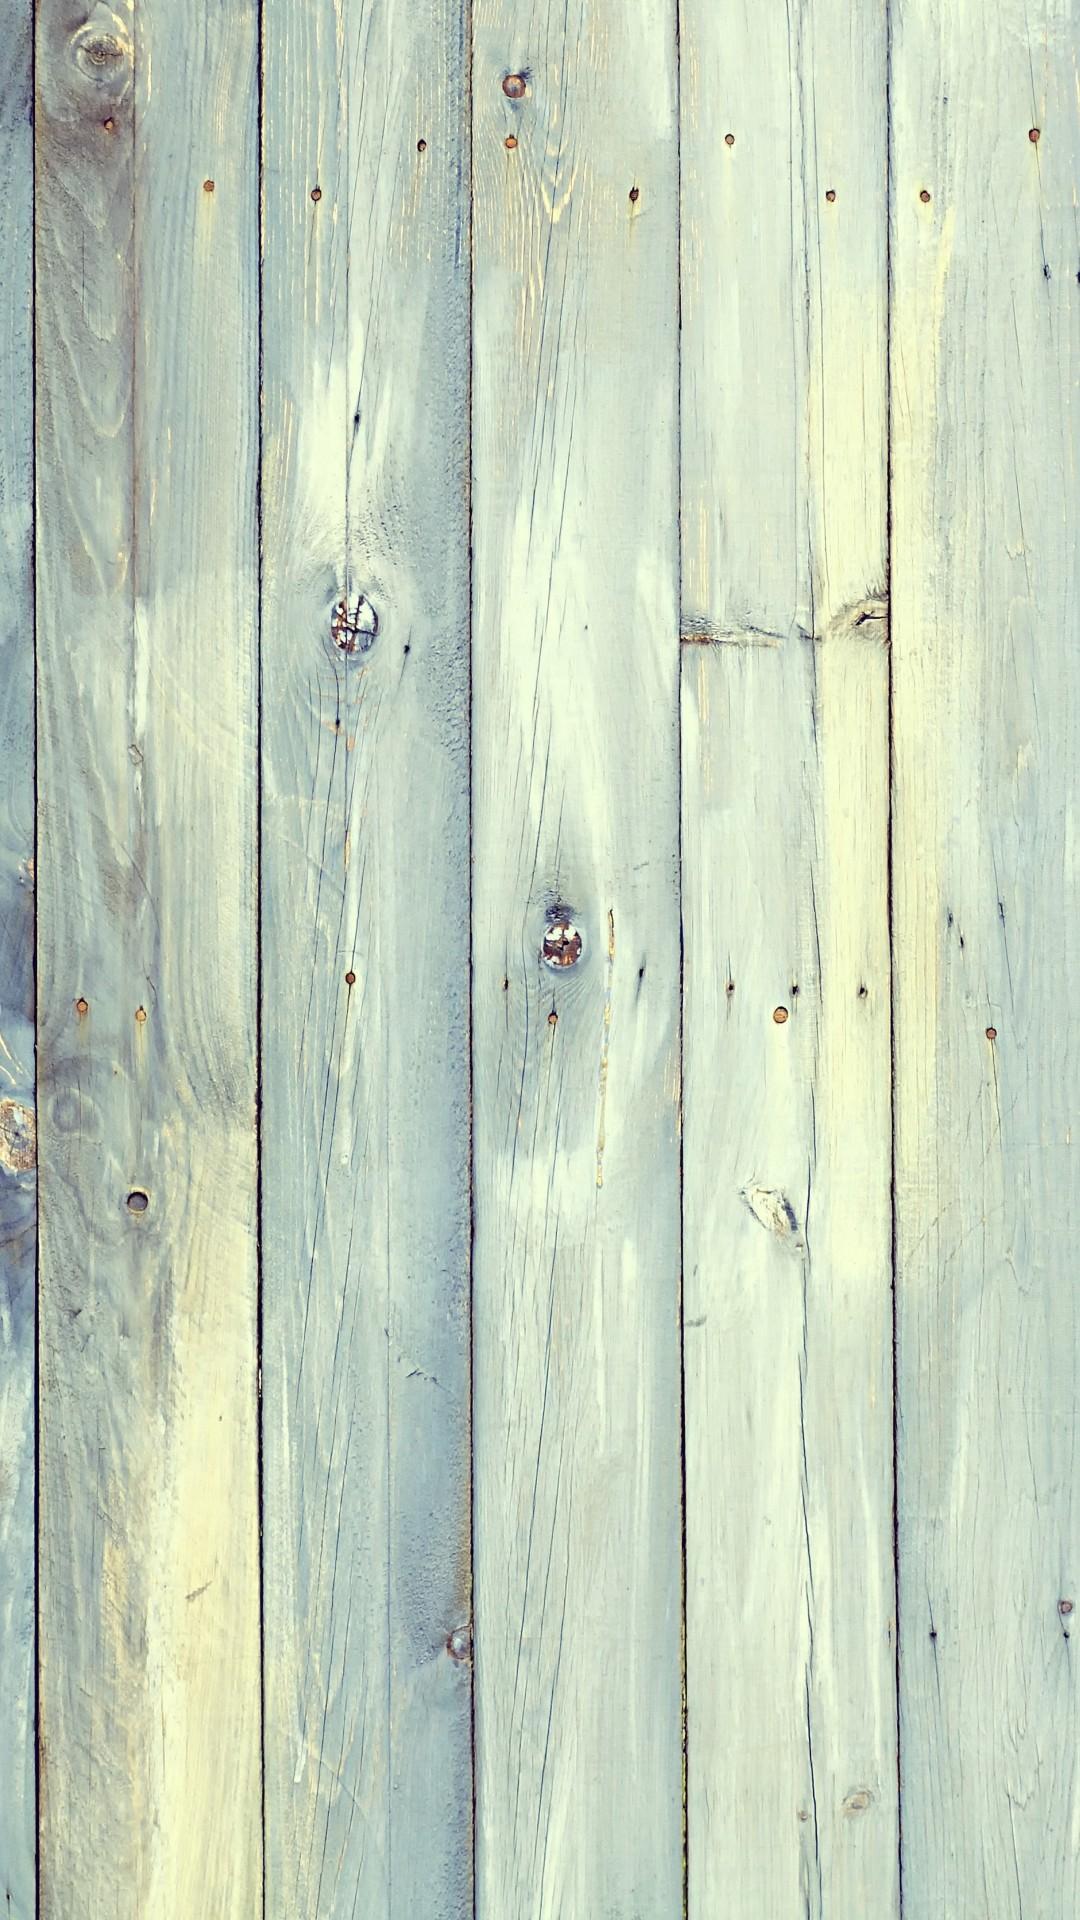 Wood iphone 6 wallpaper